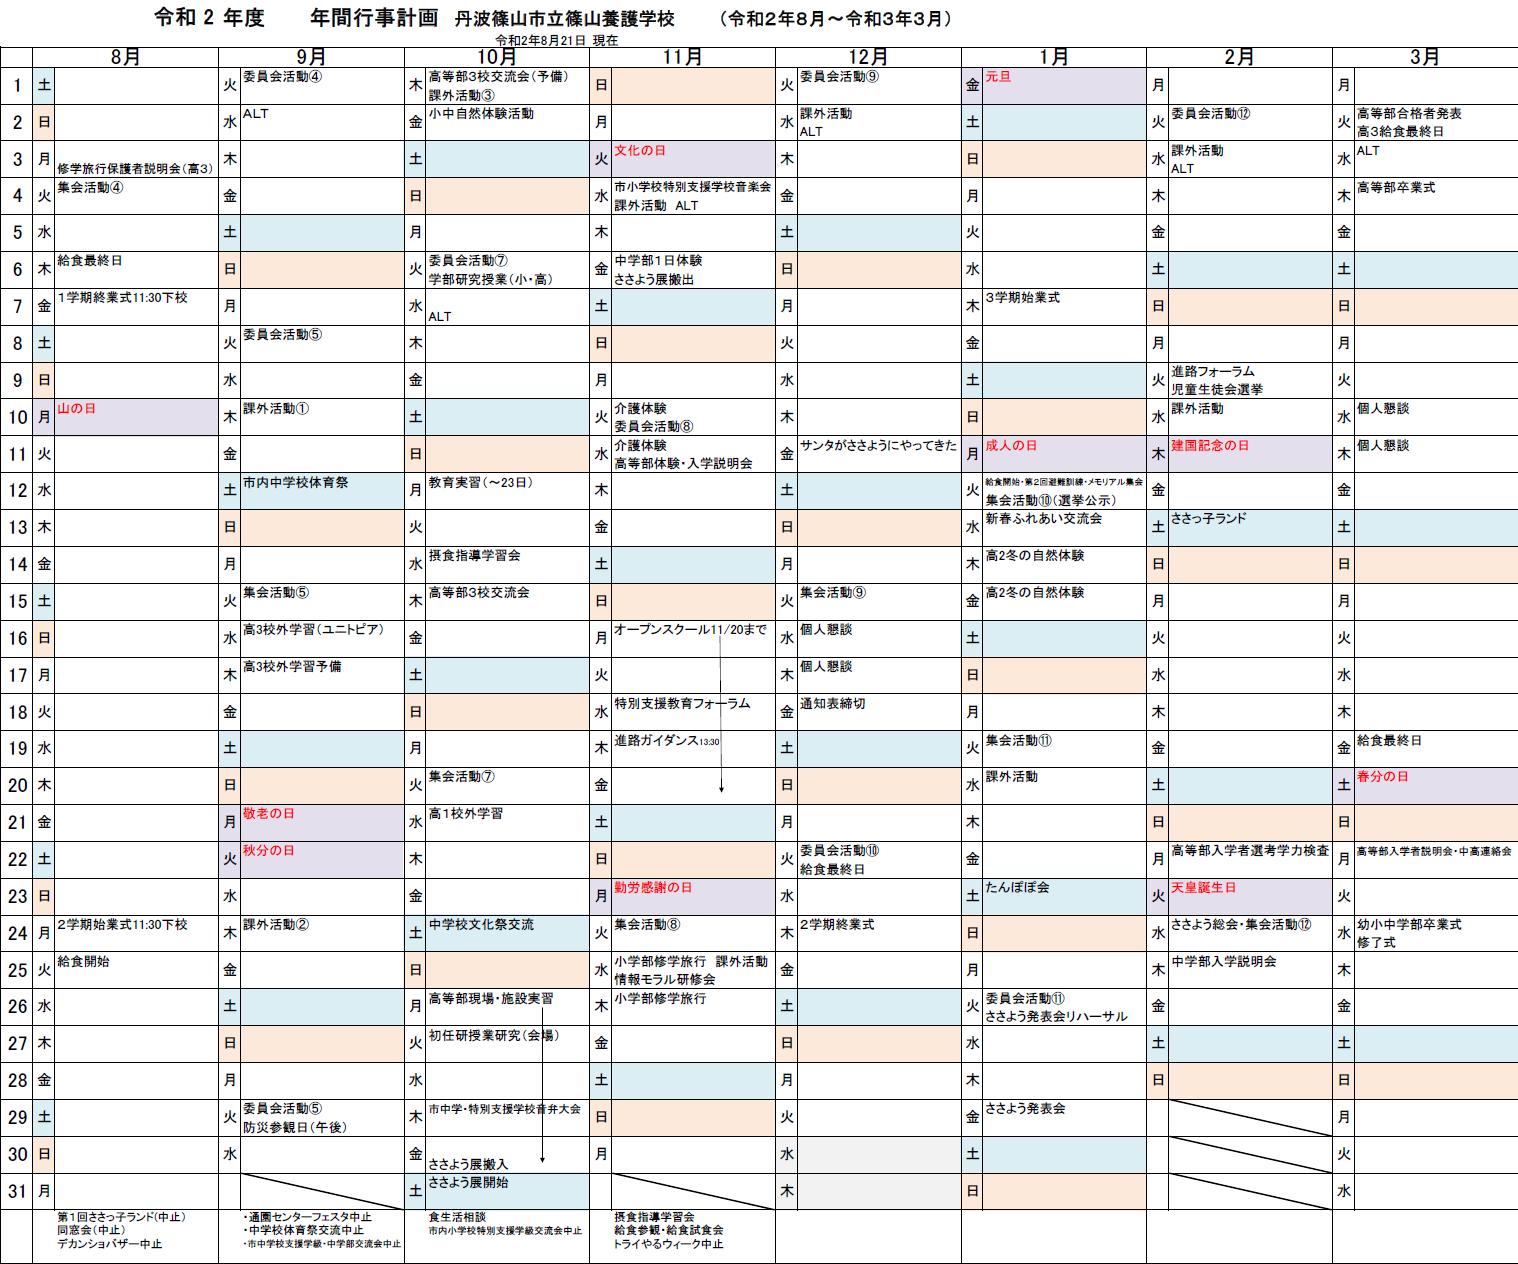 年間行事計画(令和2年8月~令和3年3月)